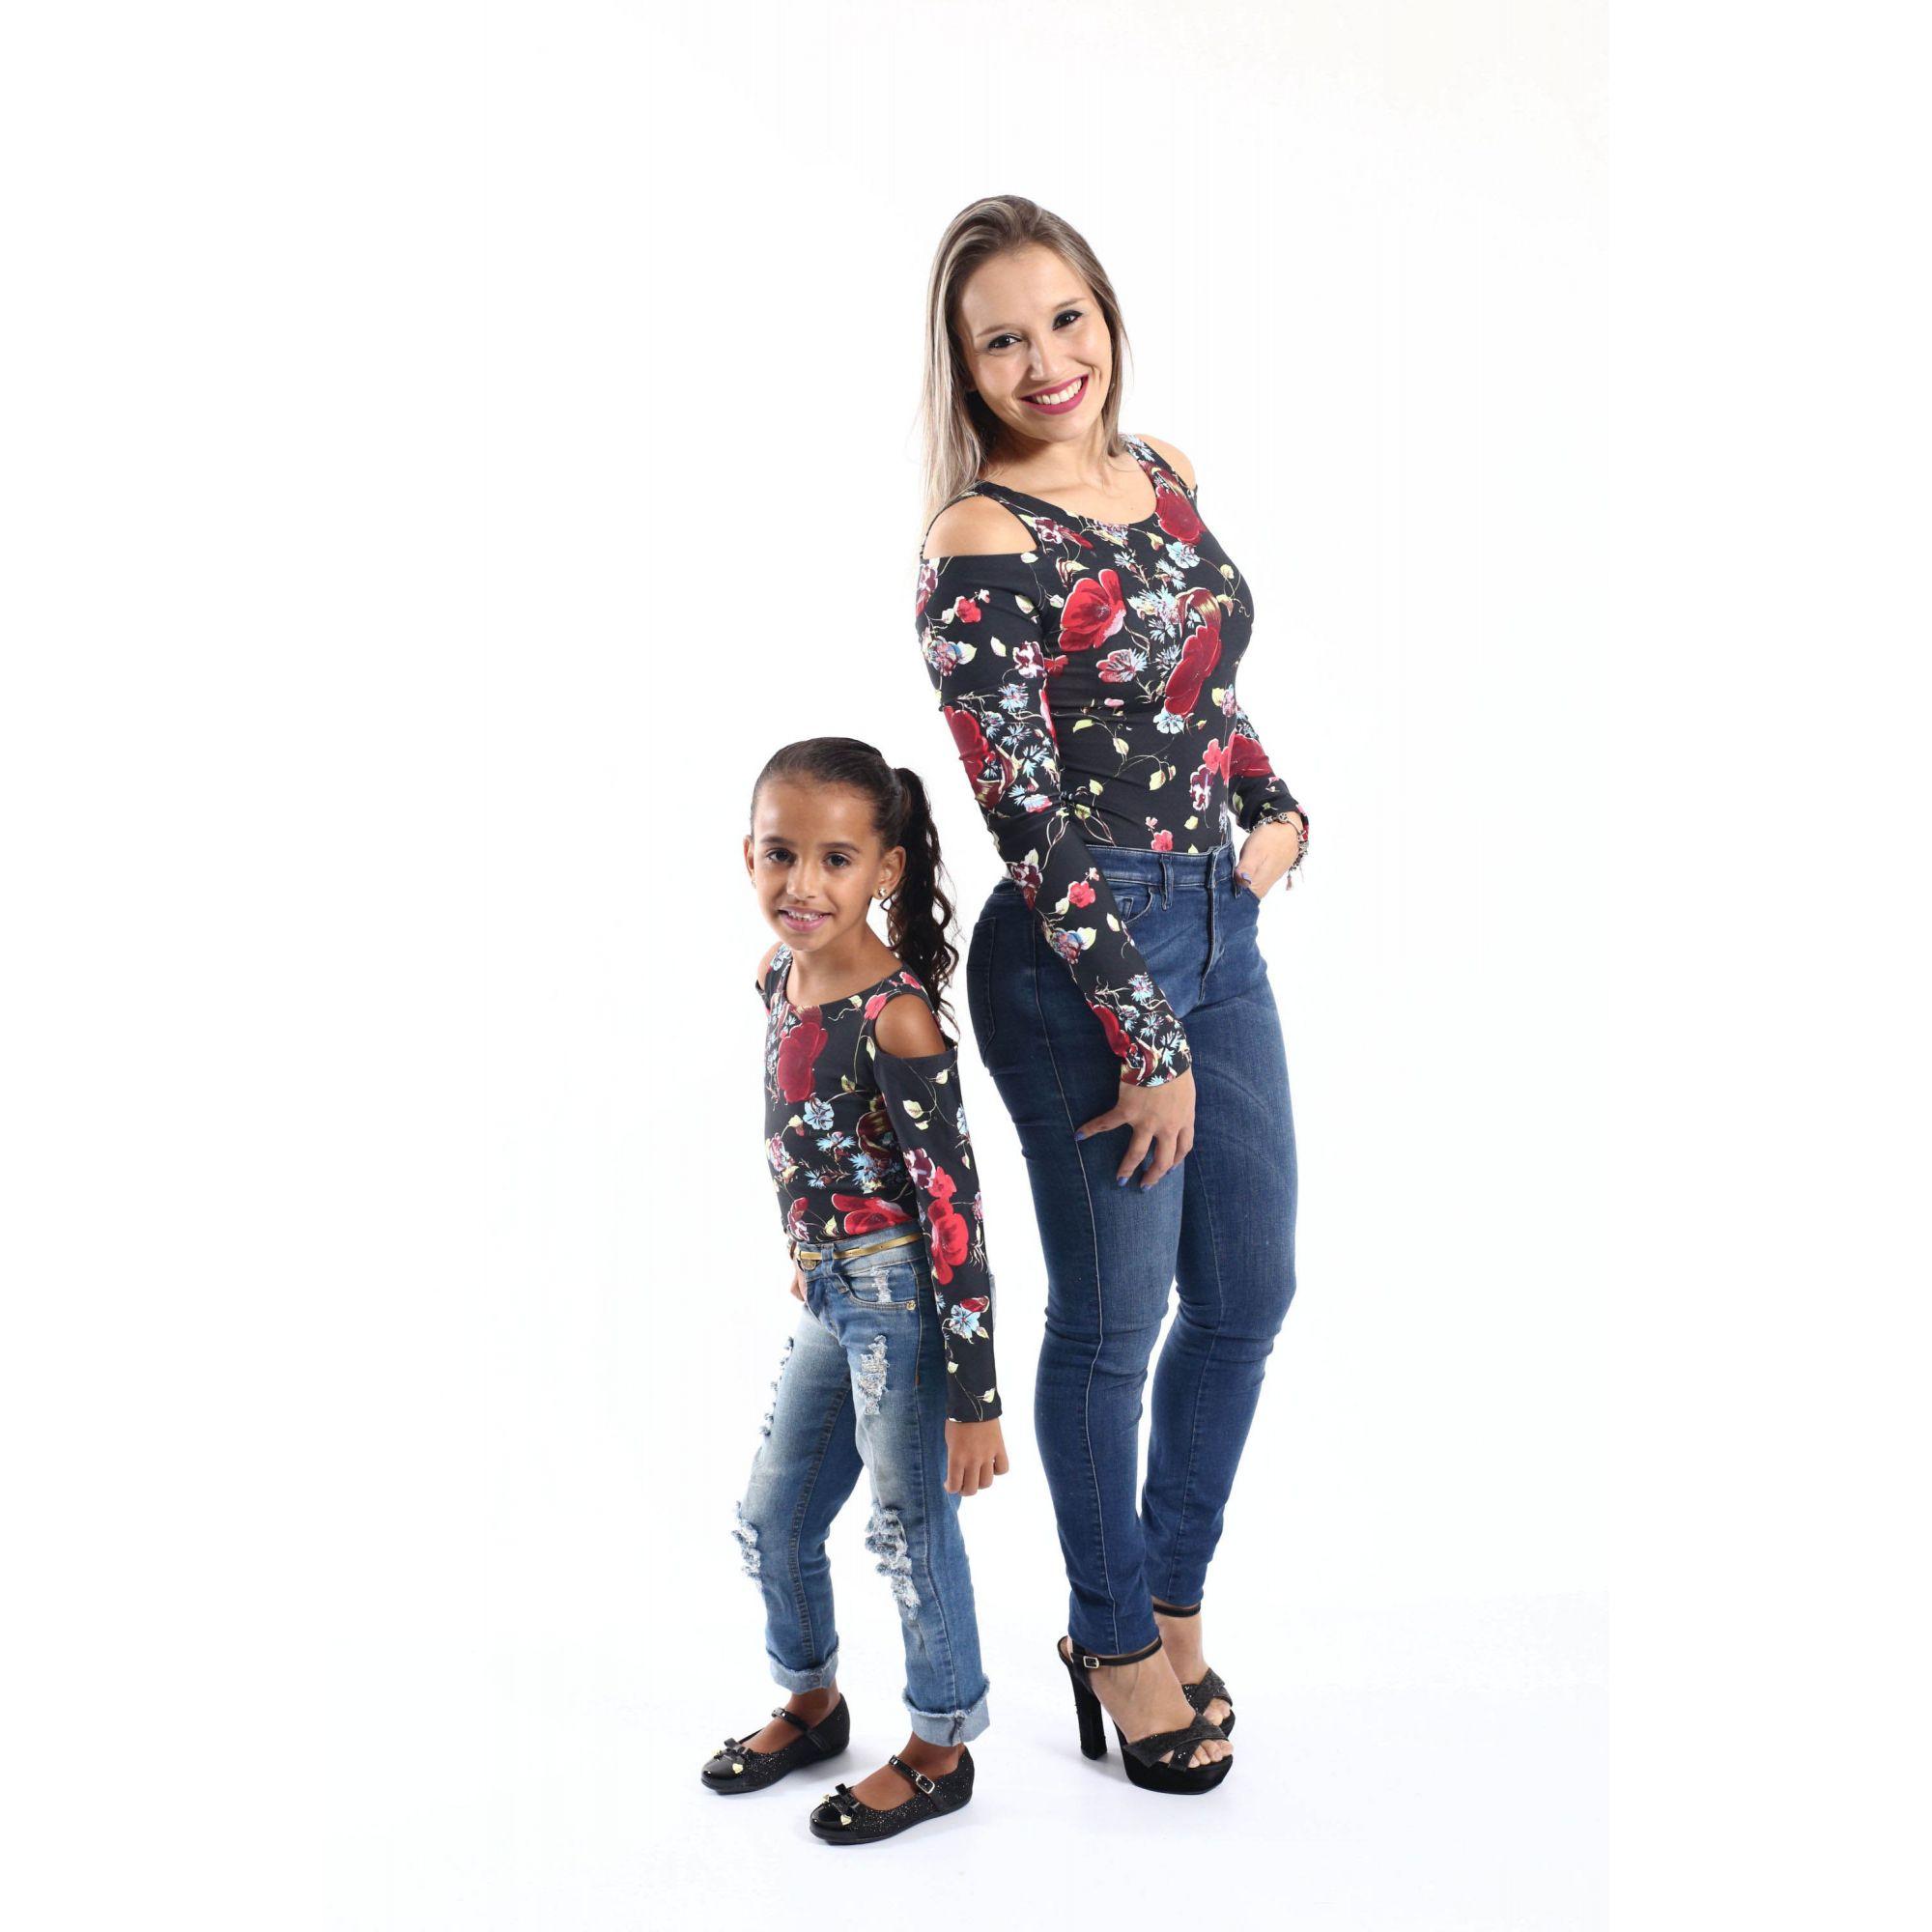 Mãe e Filha > Kit 02 Bodys Femininos manga Longa Rosas  [Coleção Tal Mãe Tal Filha]  - Heitor Fashion Brazil